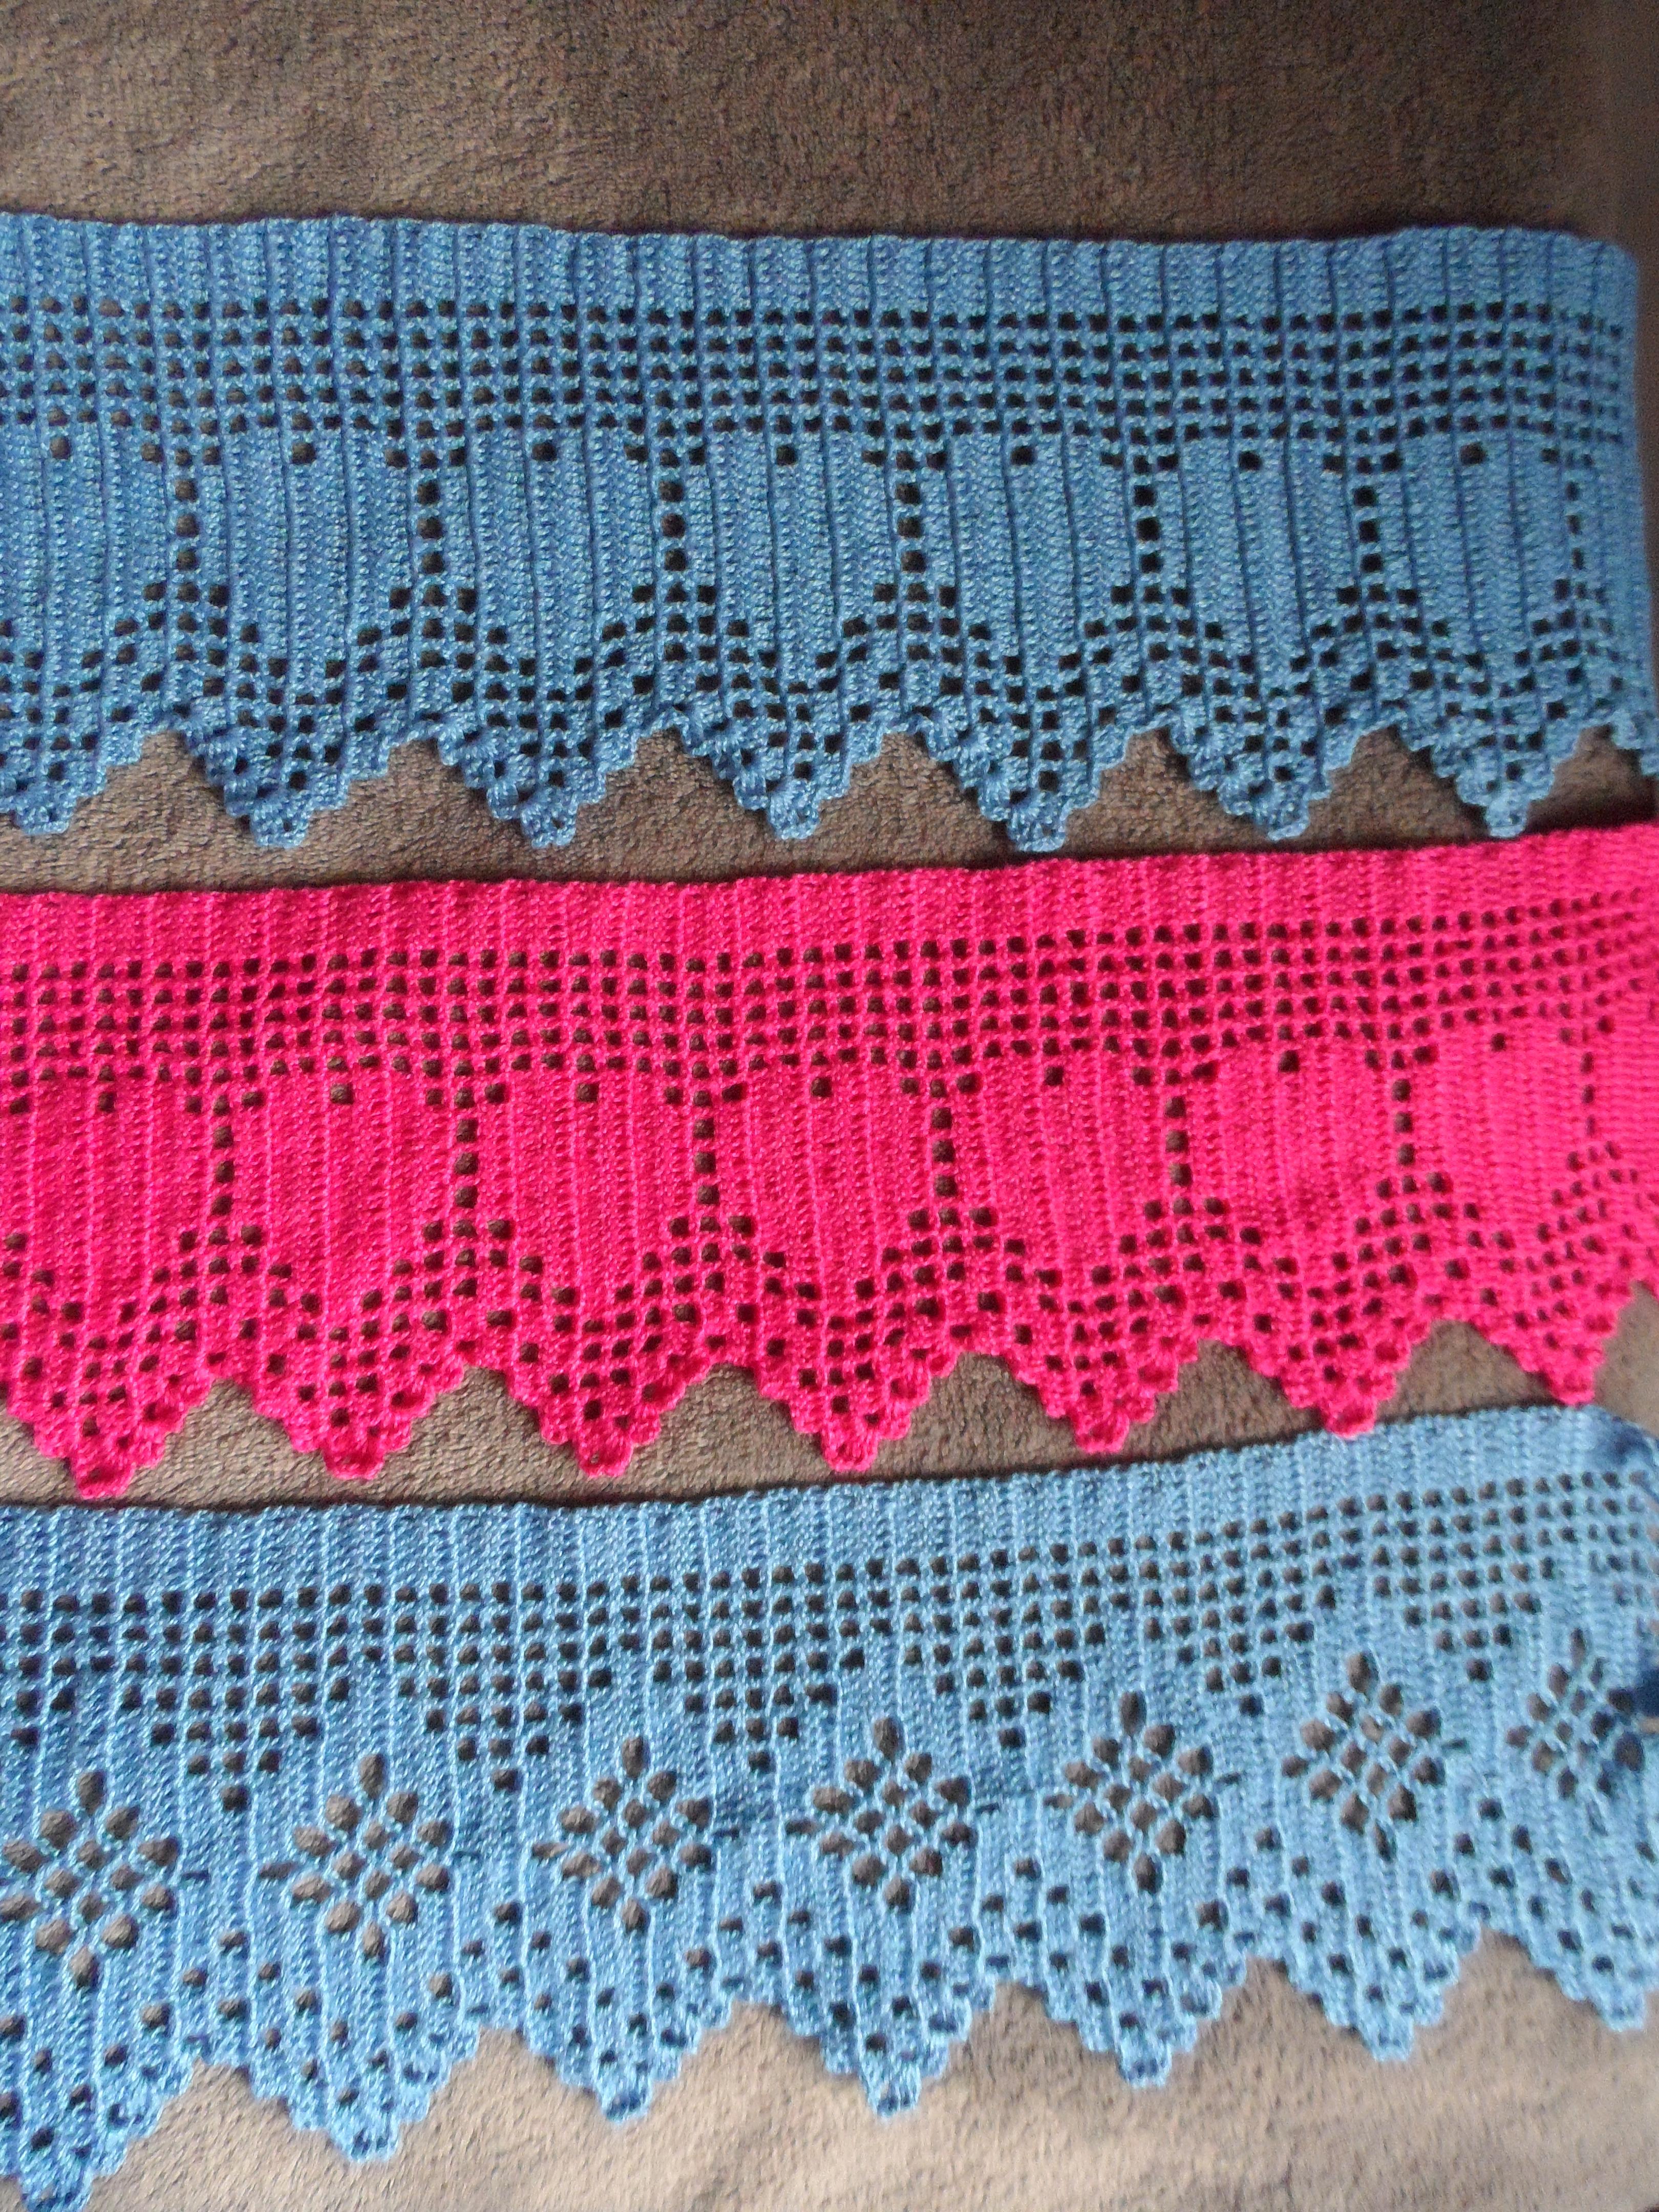 Pin Bicos De Croch Para Panos Prato Portal Pelautscom on Pinterest